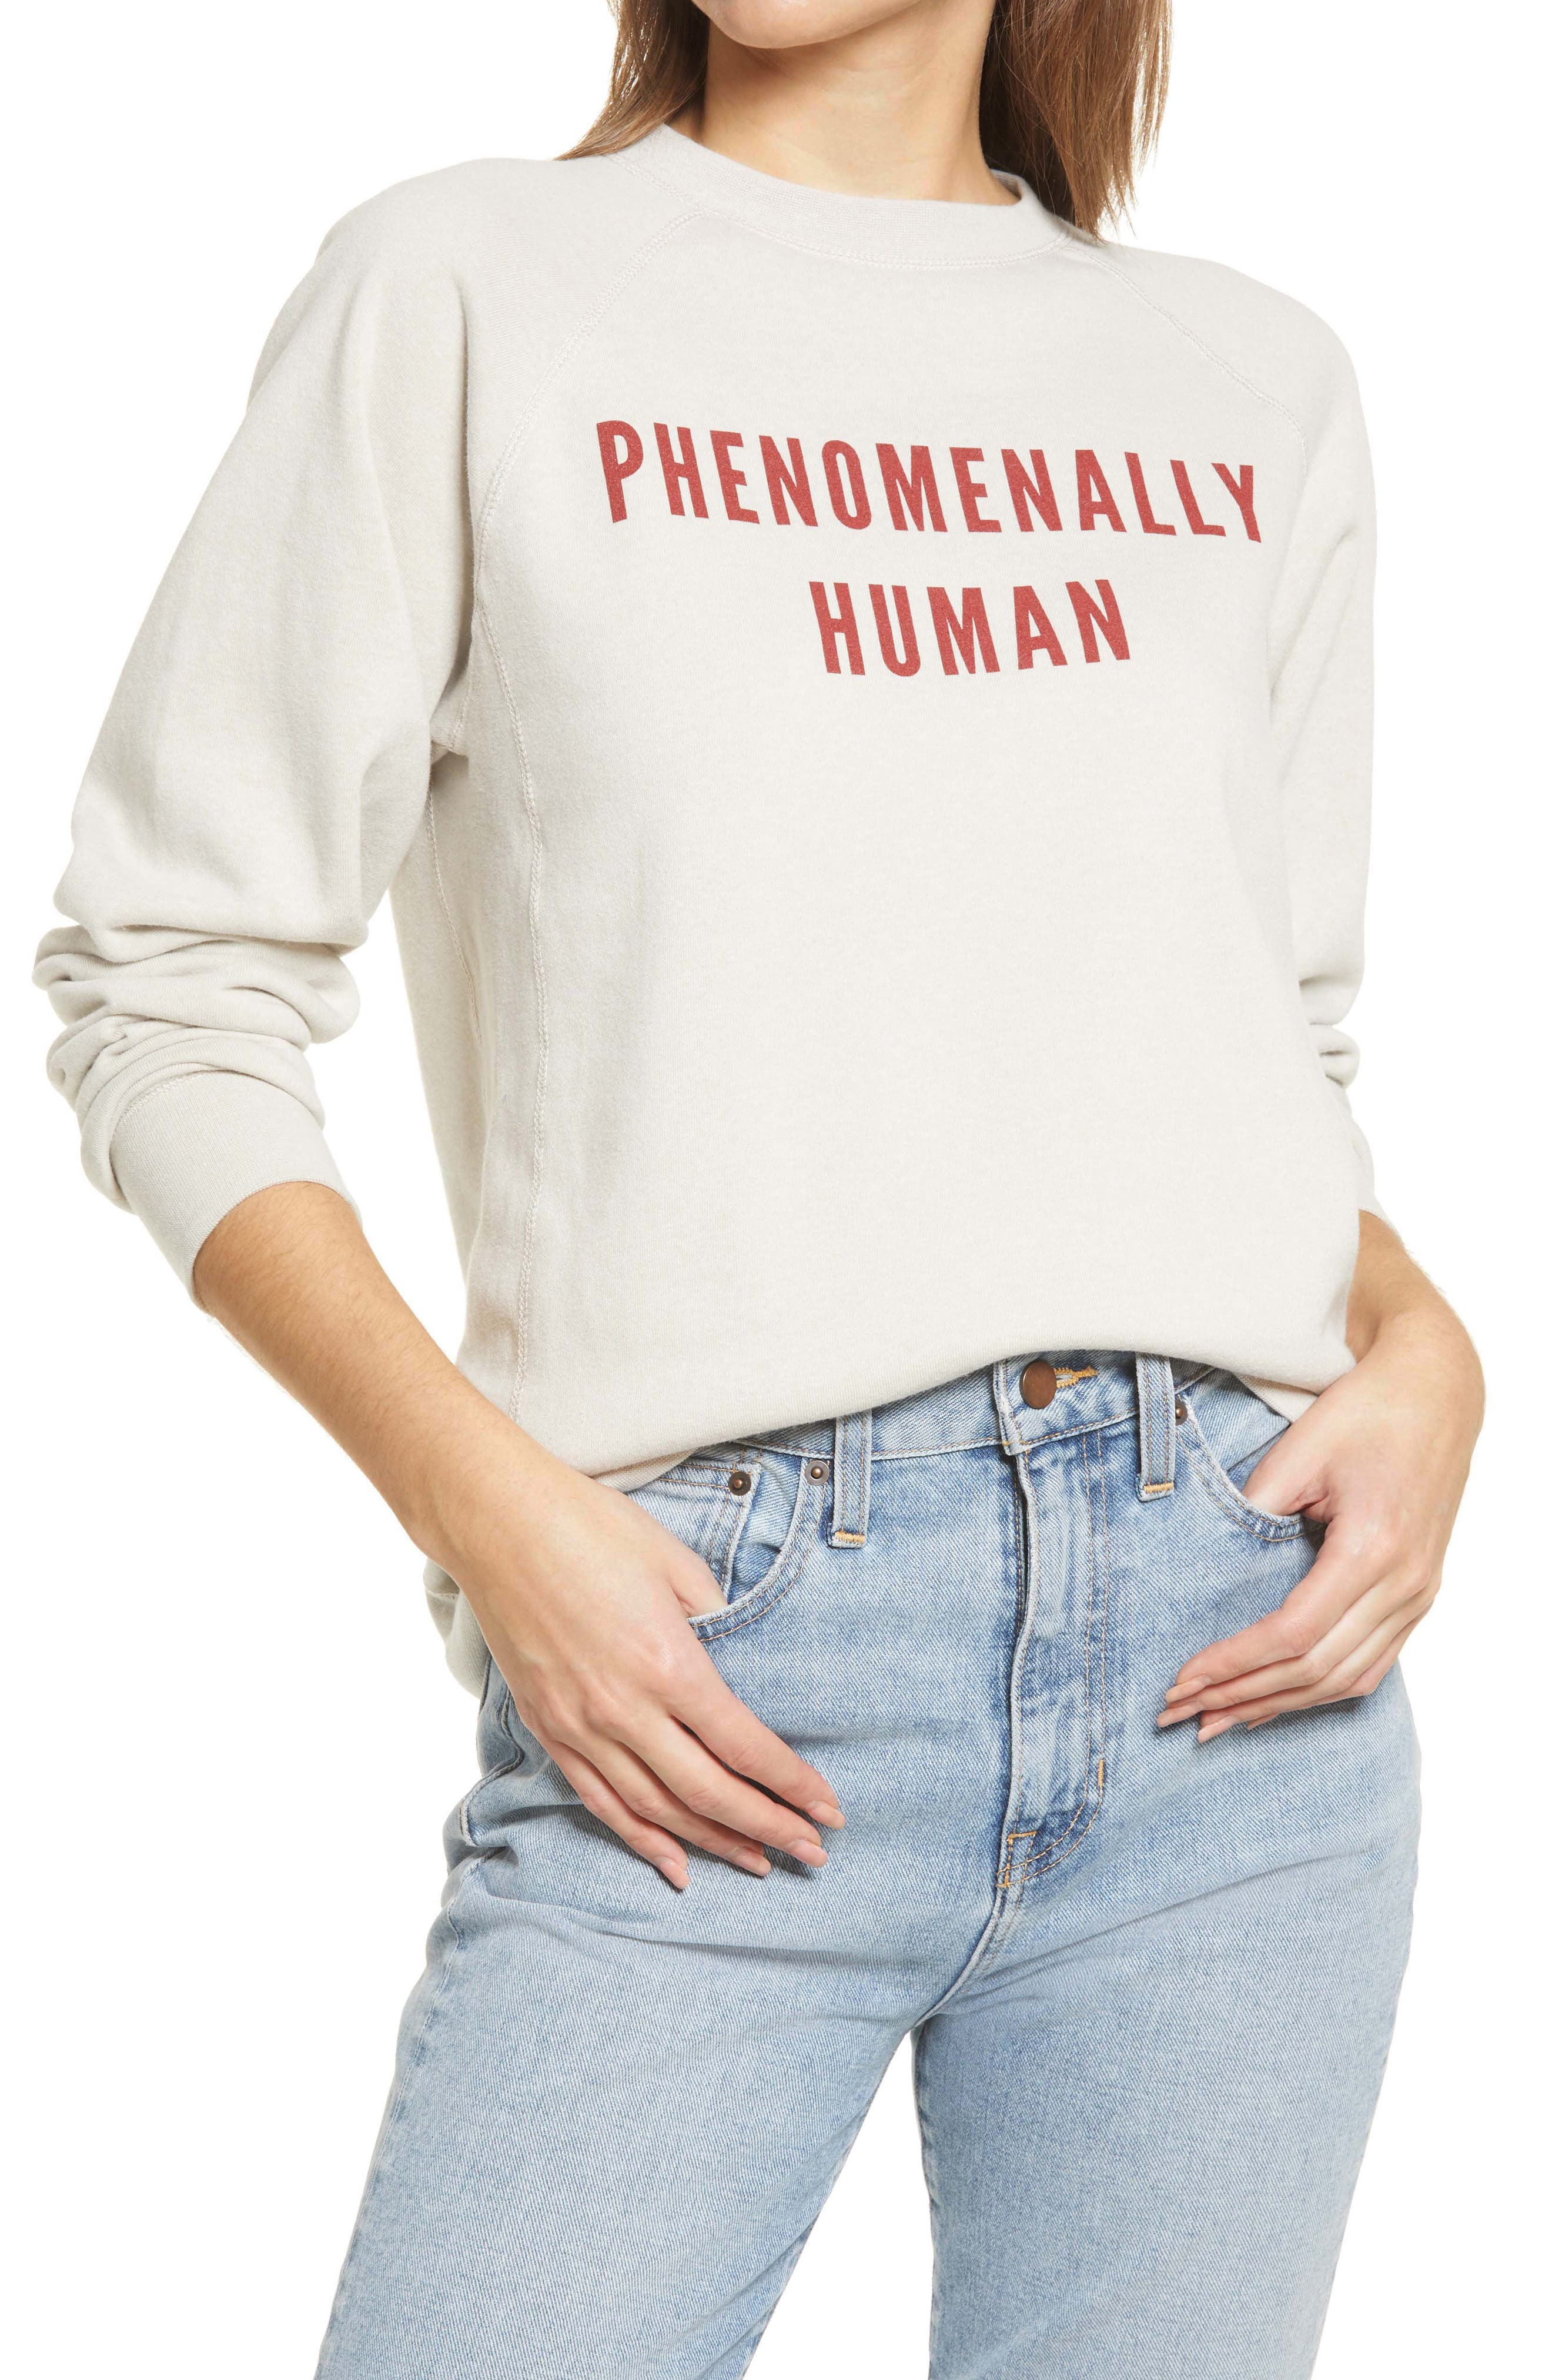 Unisex Men Women Casual Long Sleeve Hooded Printed Sweatshirt Pullover Blouse Womens Blouses Sale Autumn Plus Size Tops UK Size